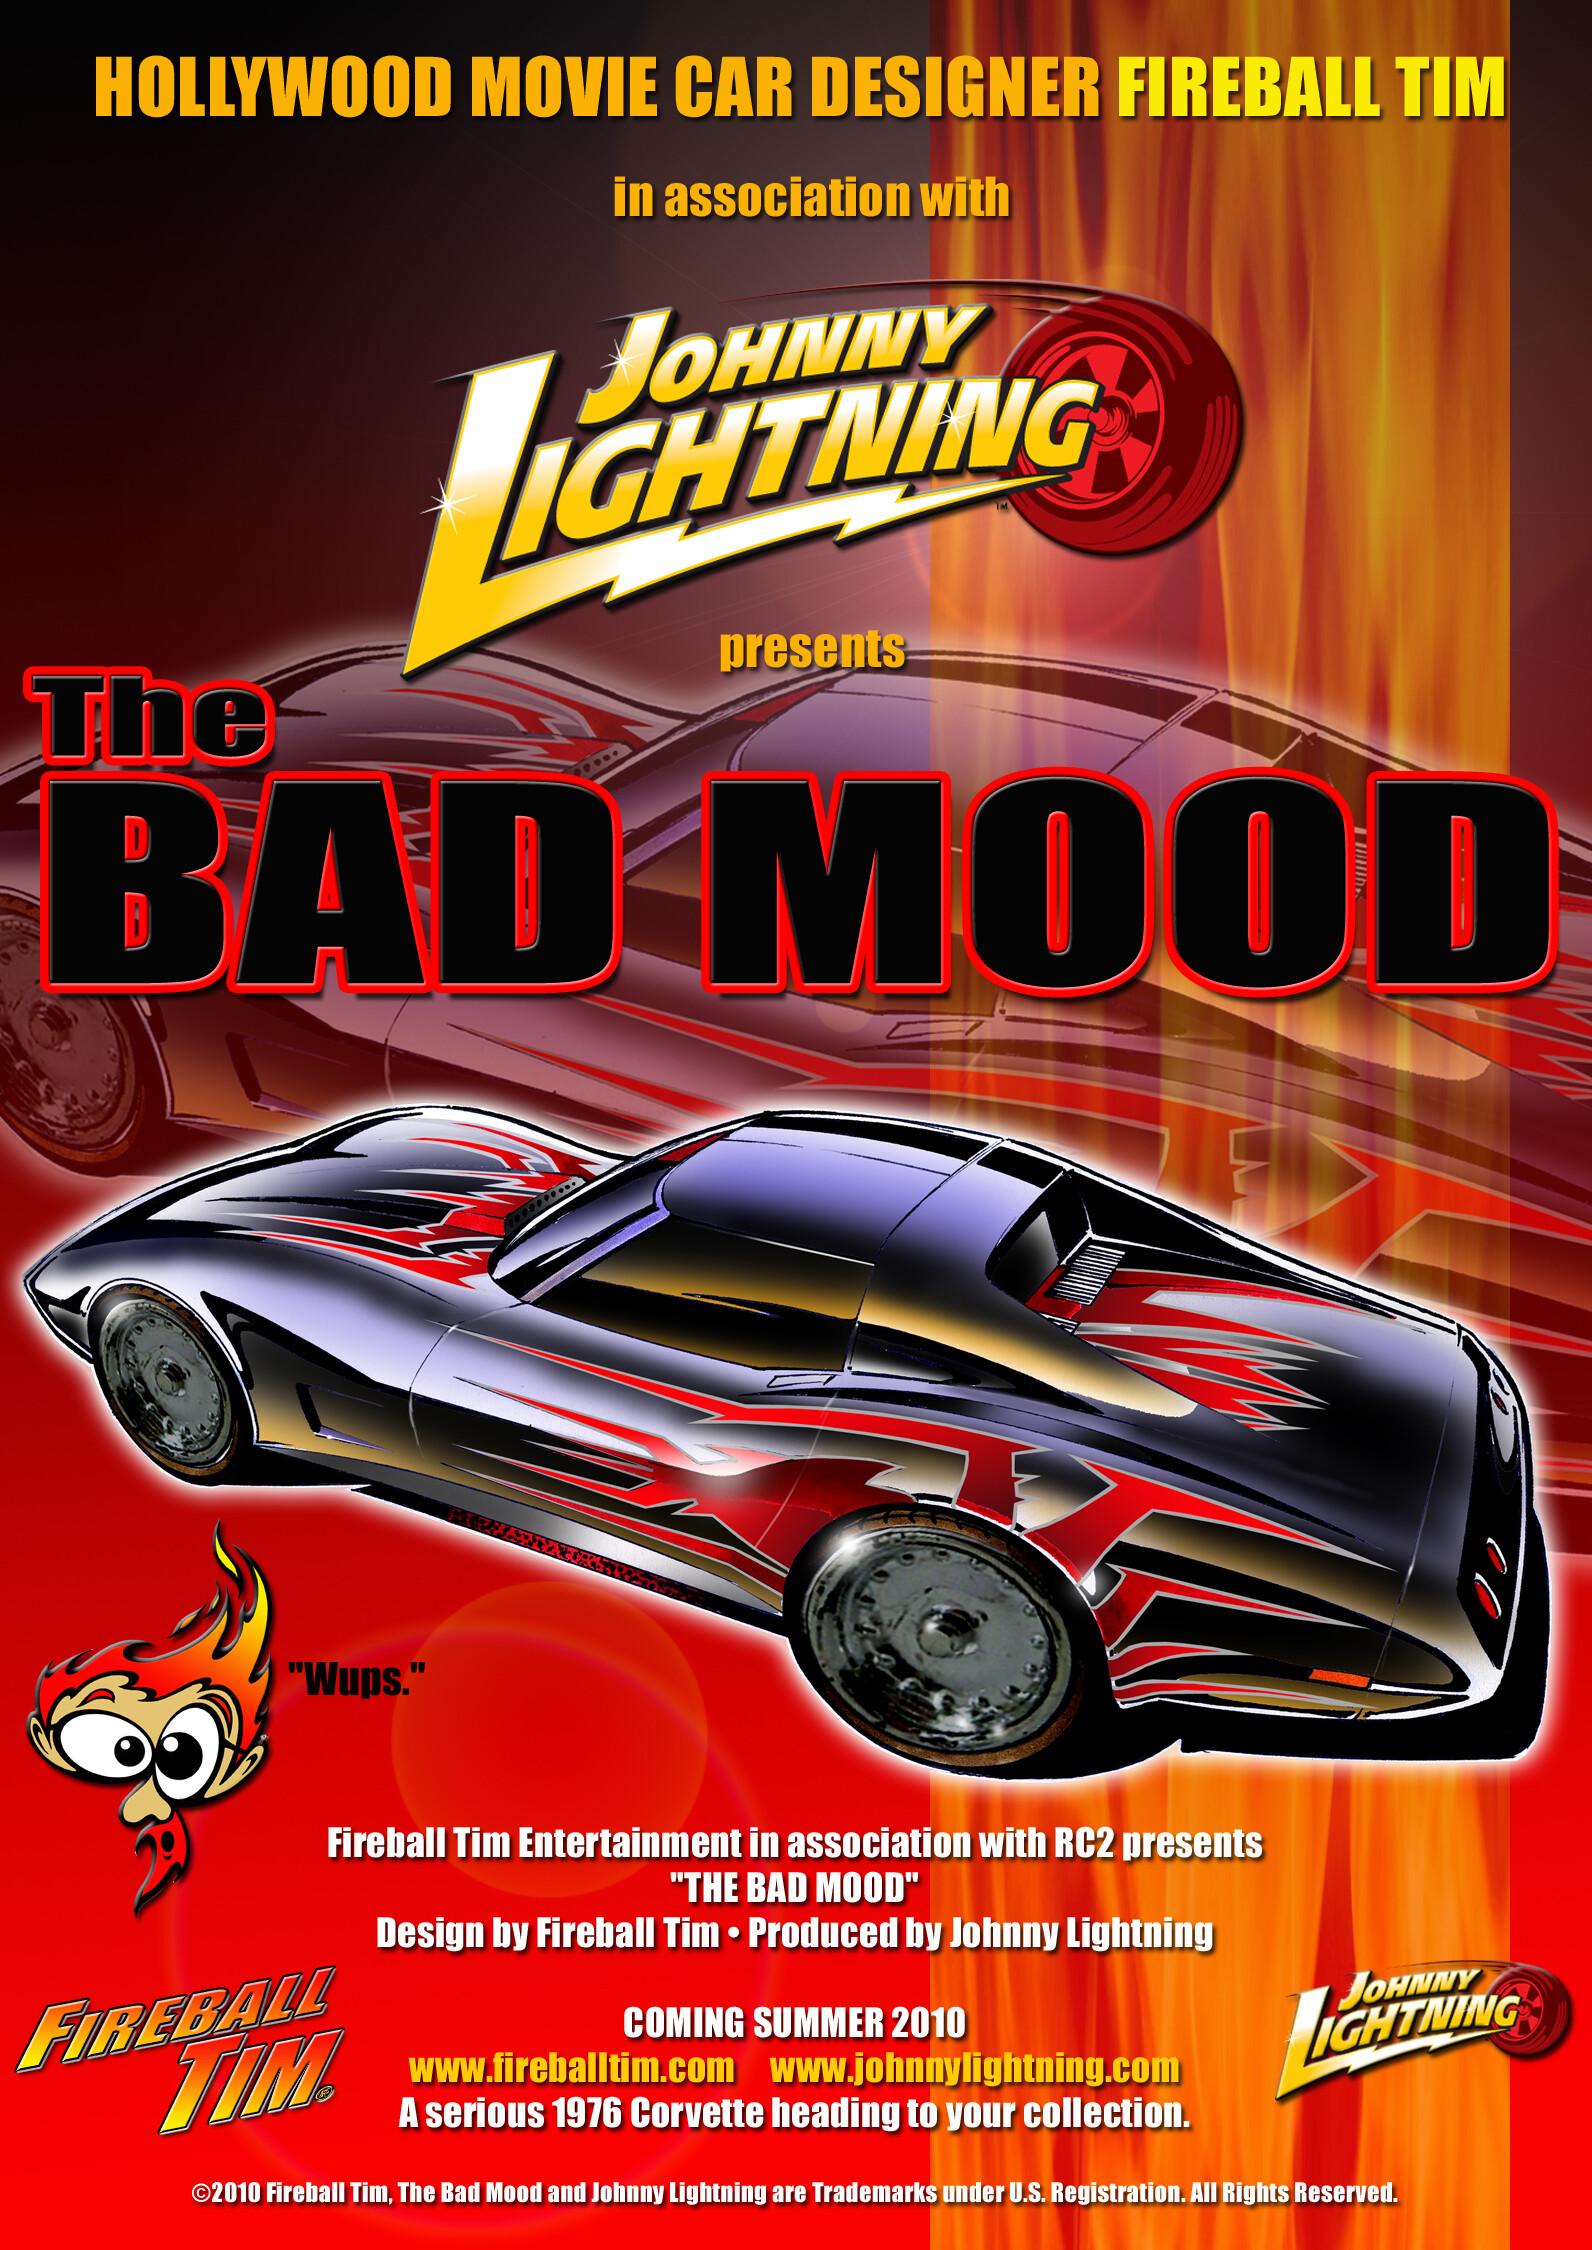 BAD MOOD 1 - CLIENT - JOHNNY LIGHTNING/RC2